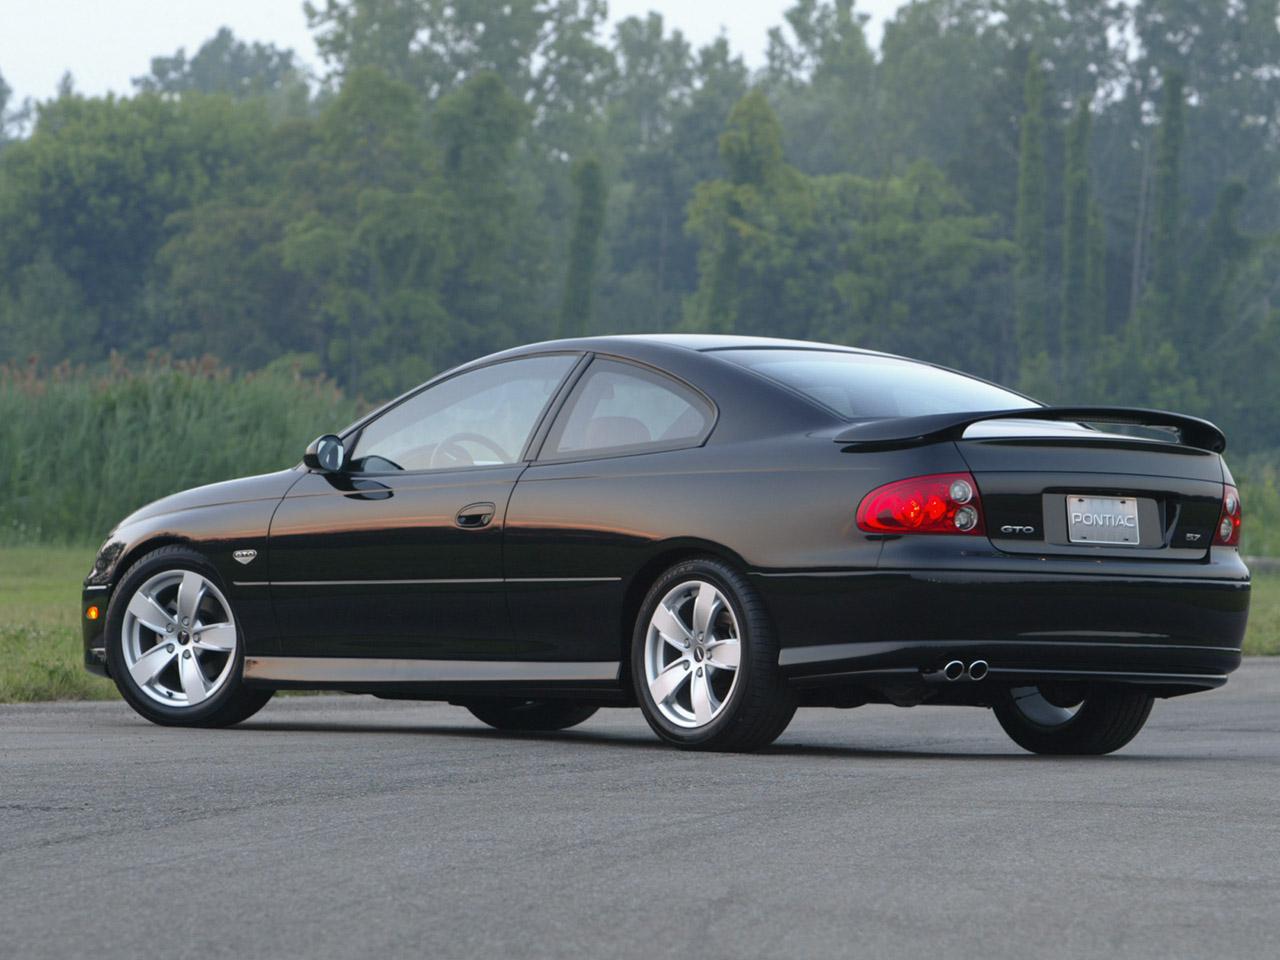 PONTIAC GTO 5.7 black